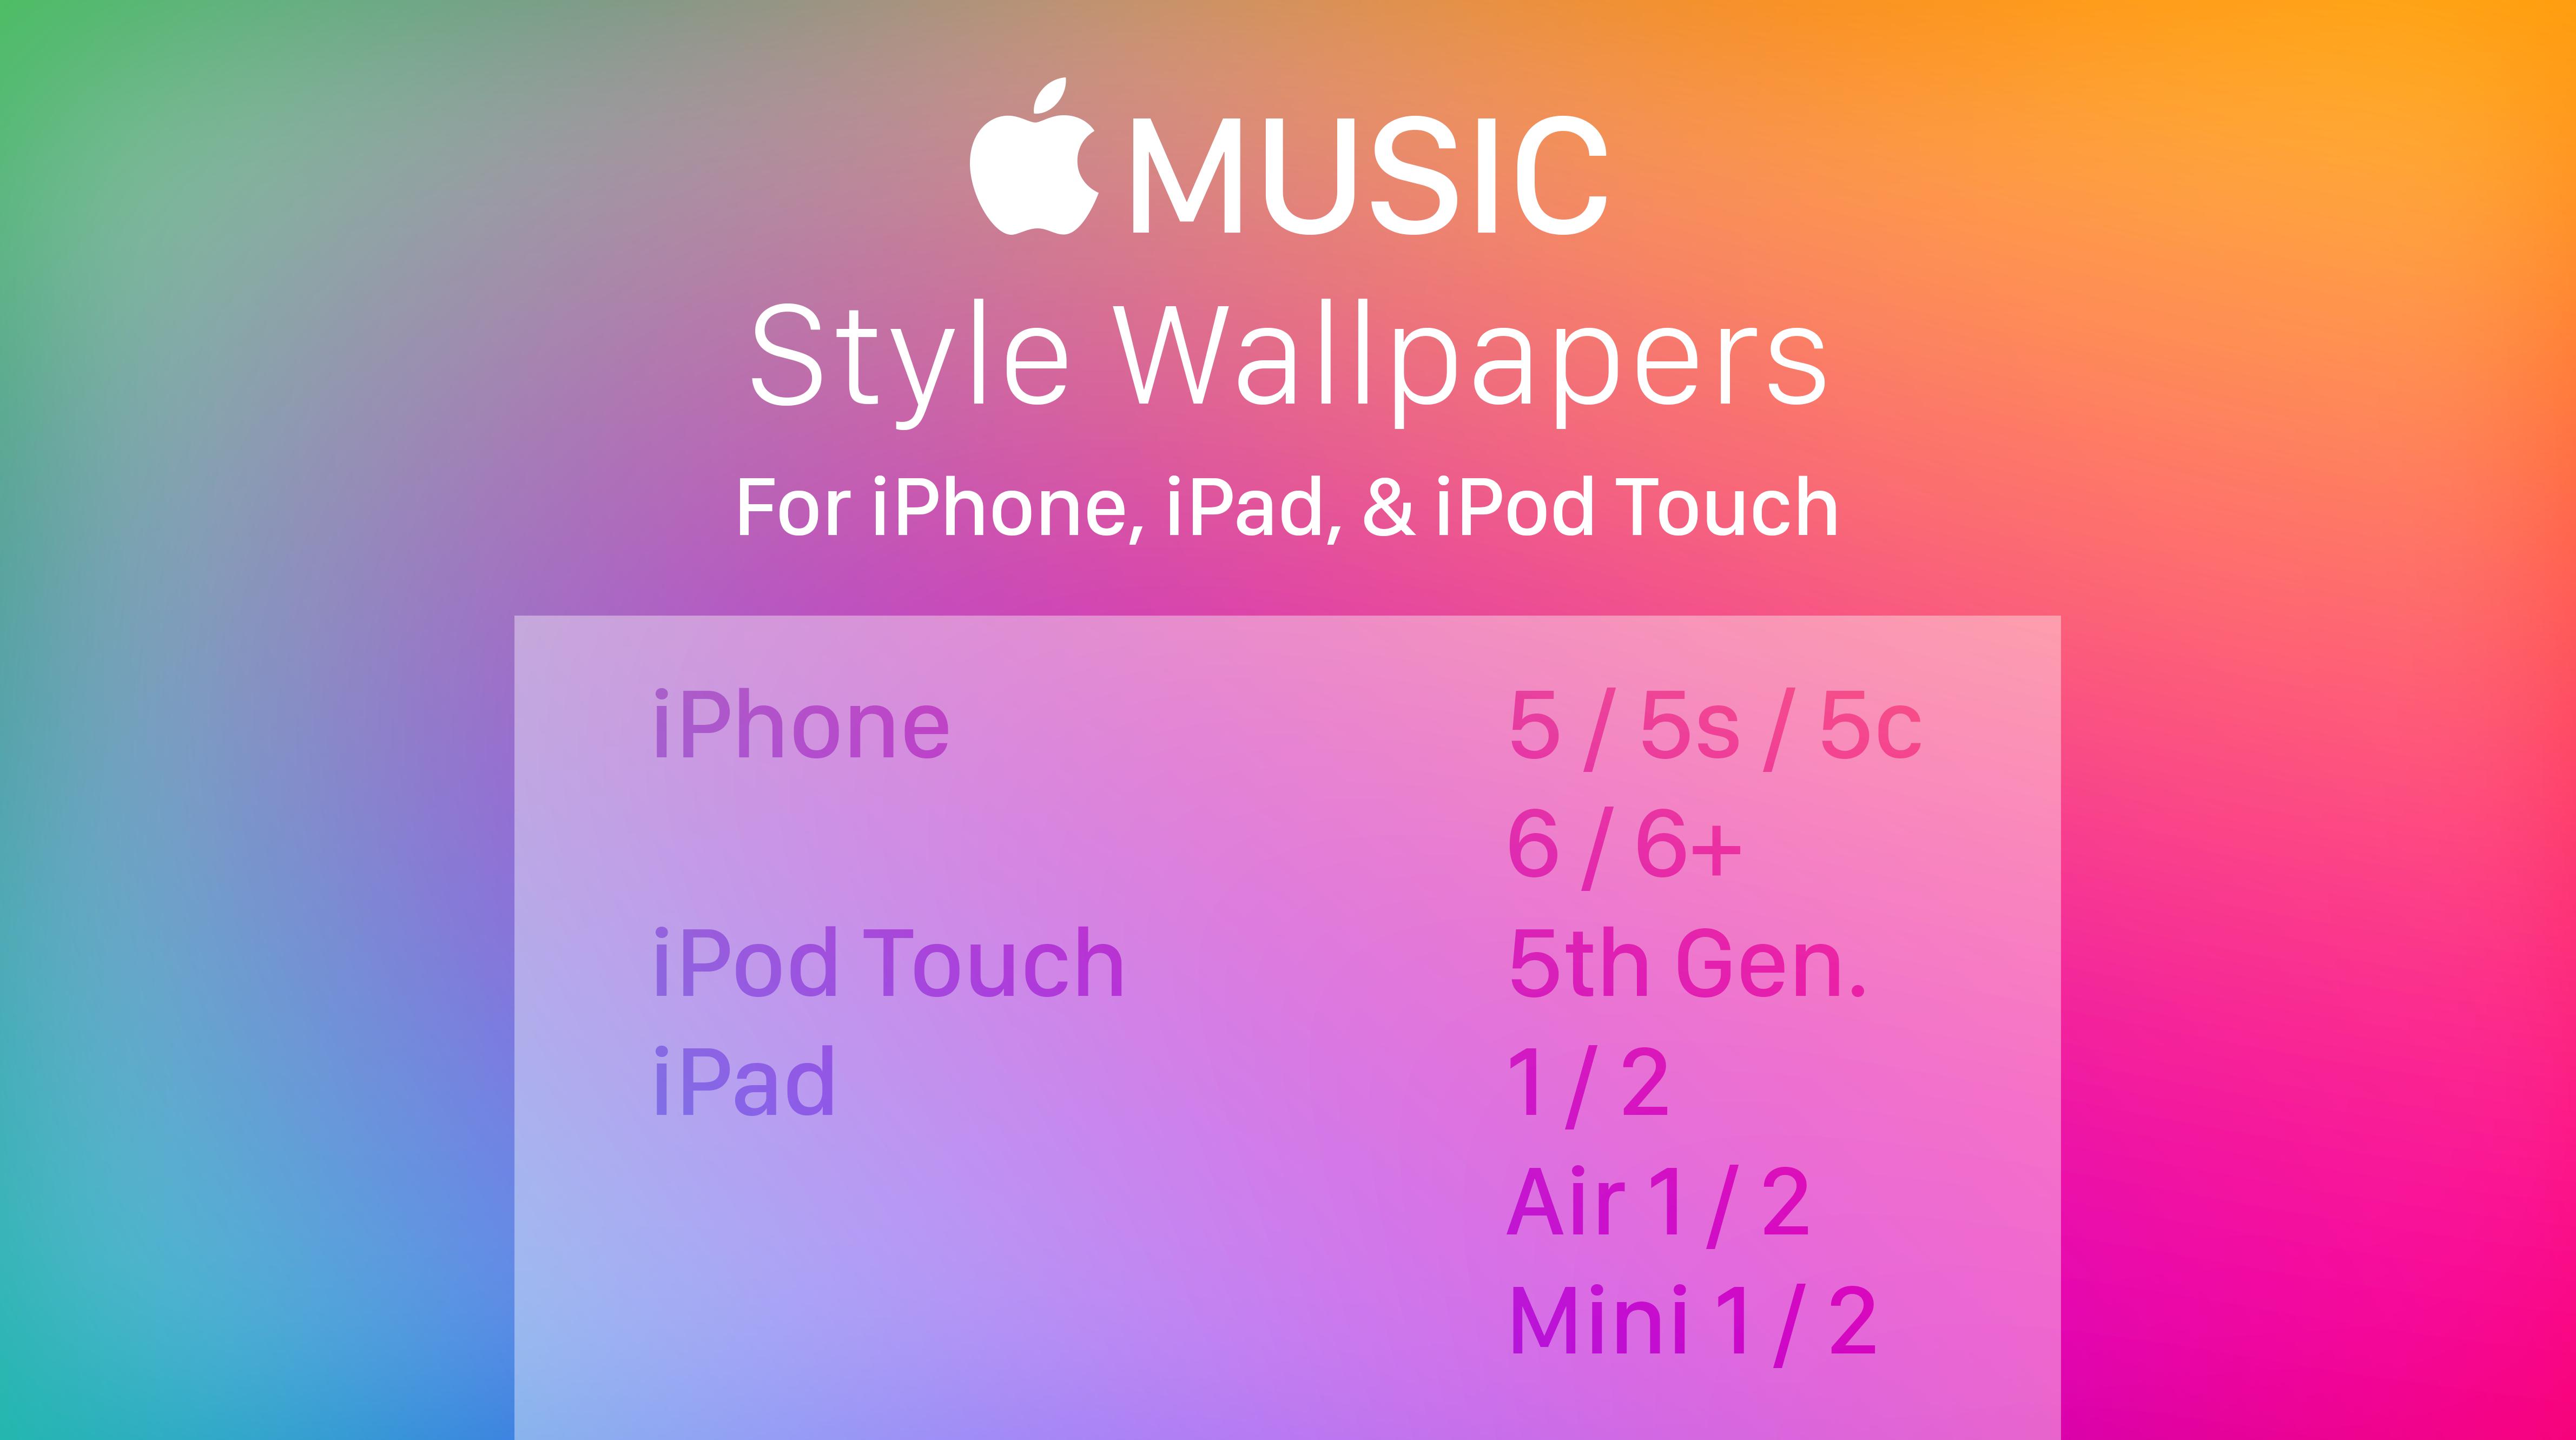 Applemusic explore applemusic on deviantart simalary44 4 0 apple music wallpapers by simalary44 malvernweather Choice Image